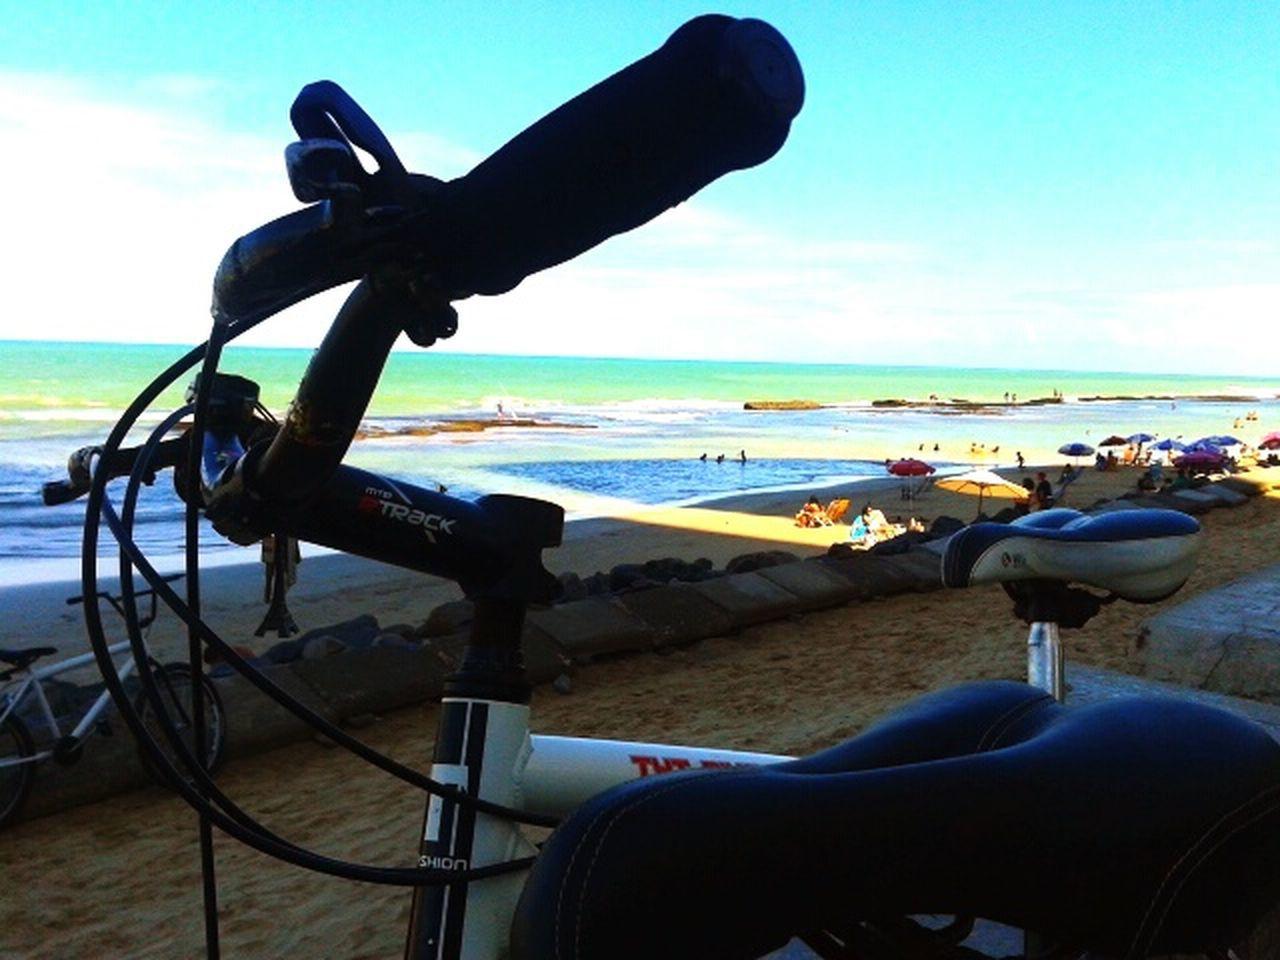 Dando um rolê para tirar o mofo. Pernambucolovers Pernambuco Pernambuco -Brazil Praia Relaxing Bike Bicicleta Enjoying Life Hello World Brazil Brasil ♥ Brasil Recife, BRASIL BoaViagemBeach Praia De Boa Viagem Mar Sea Sand